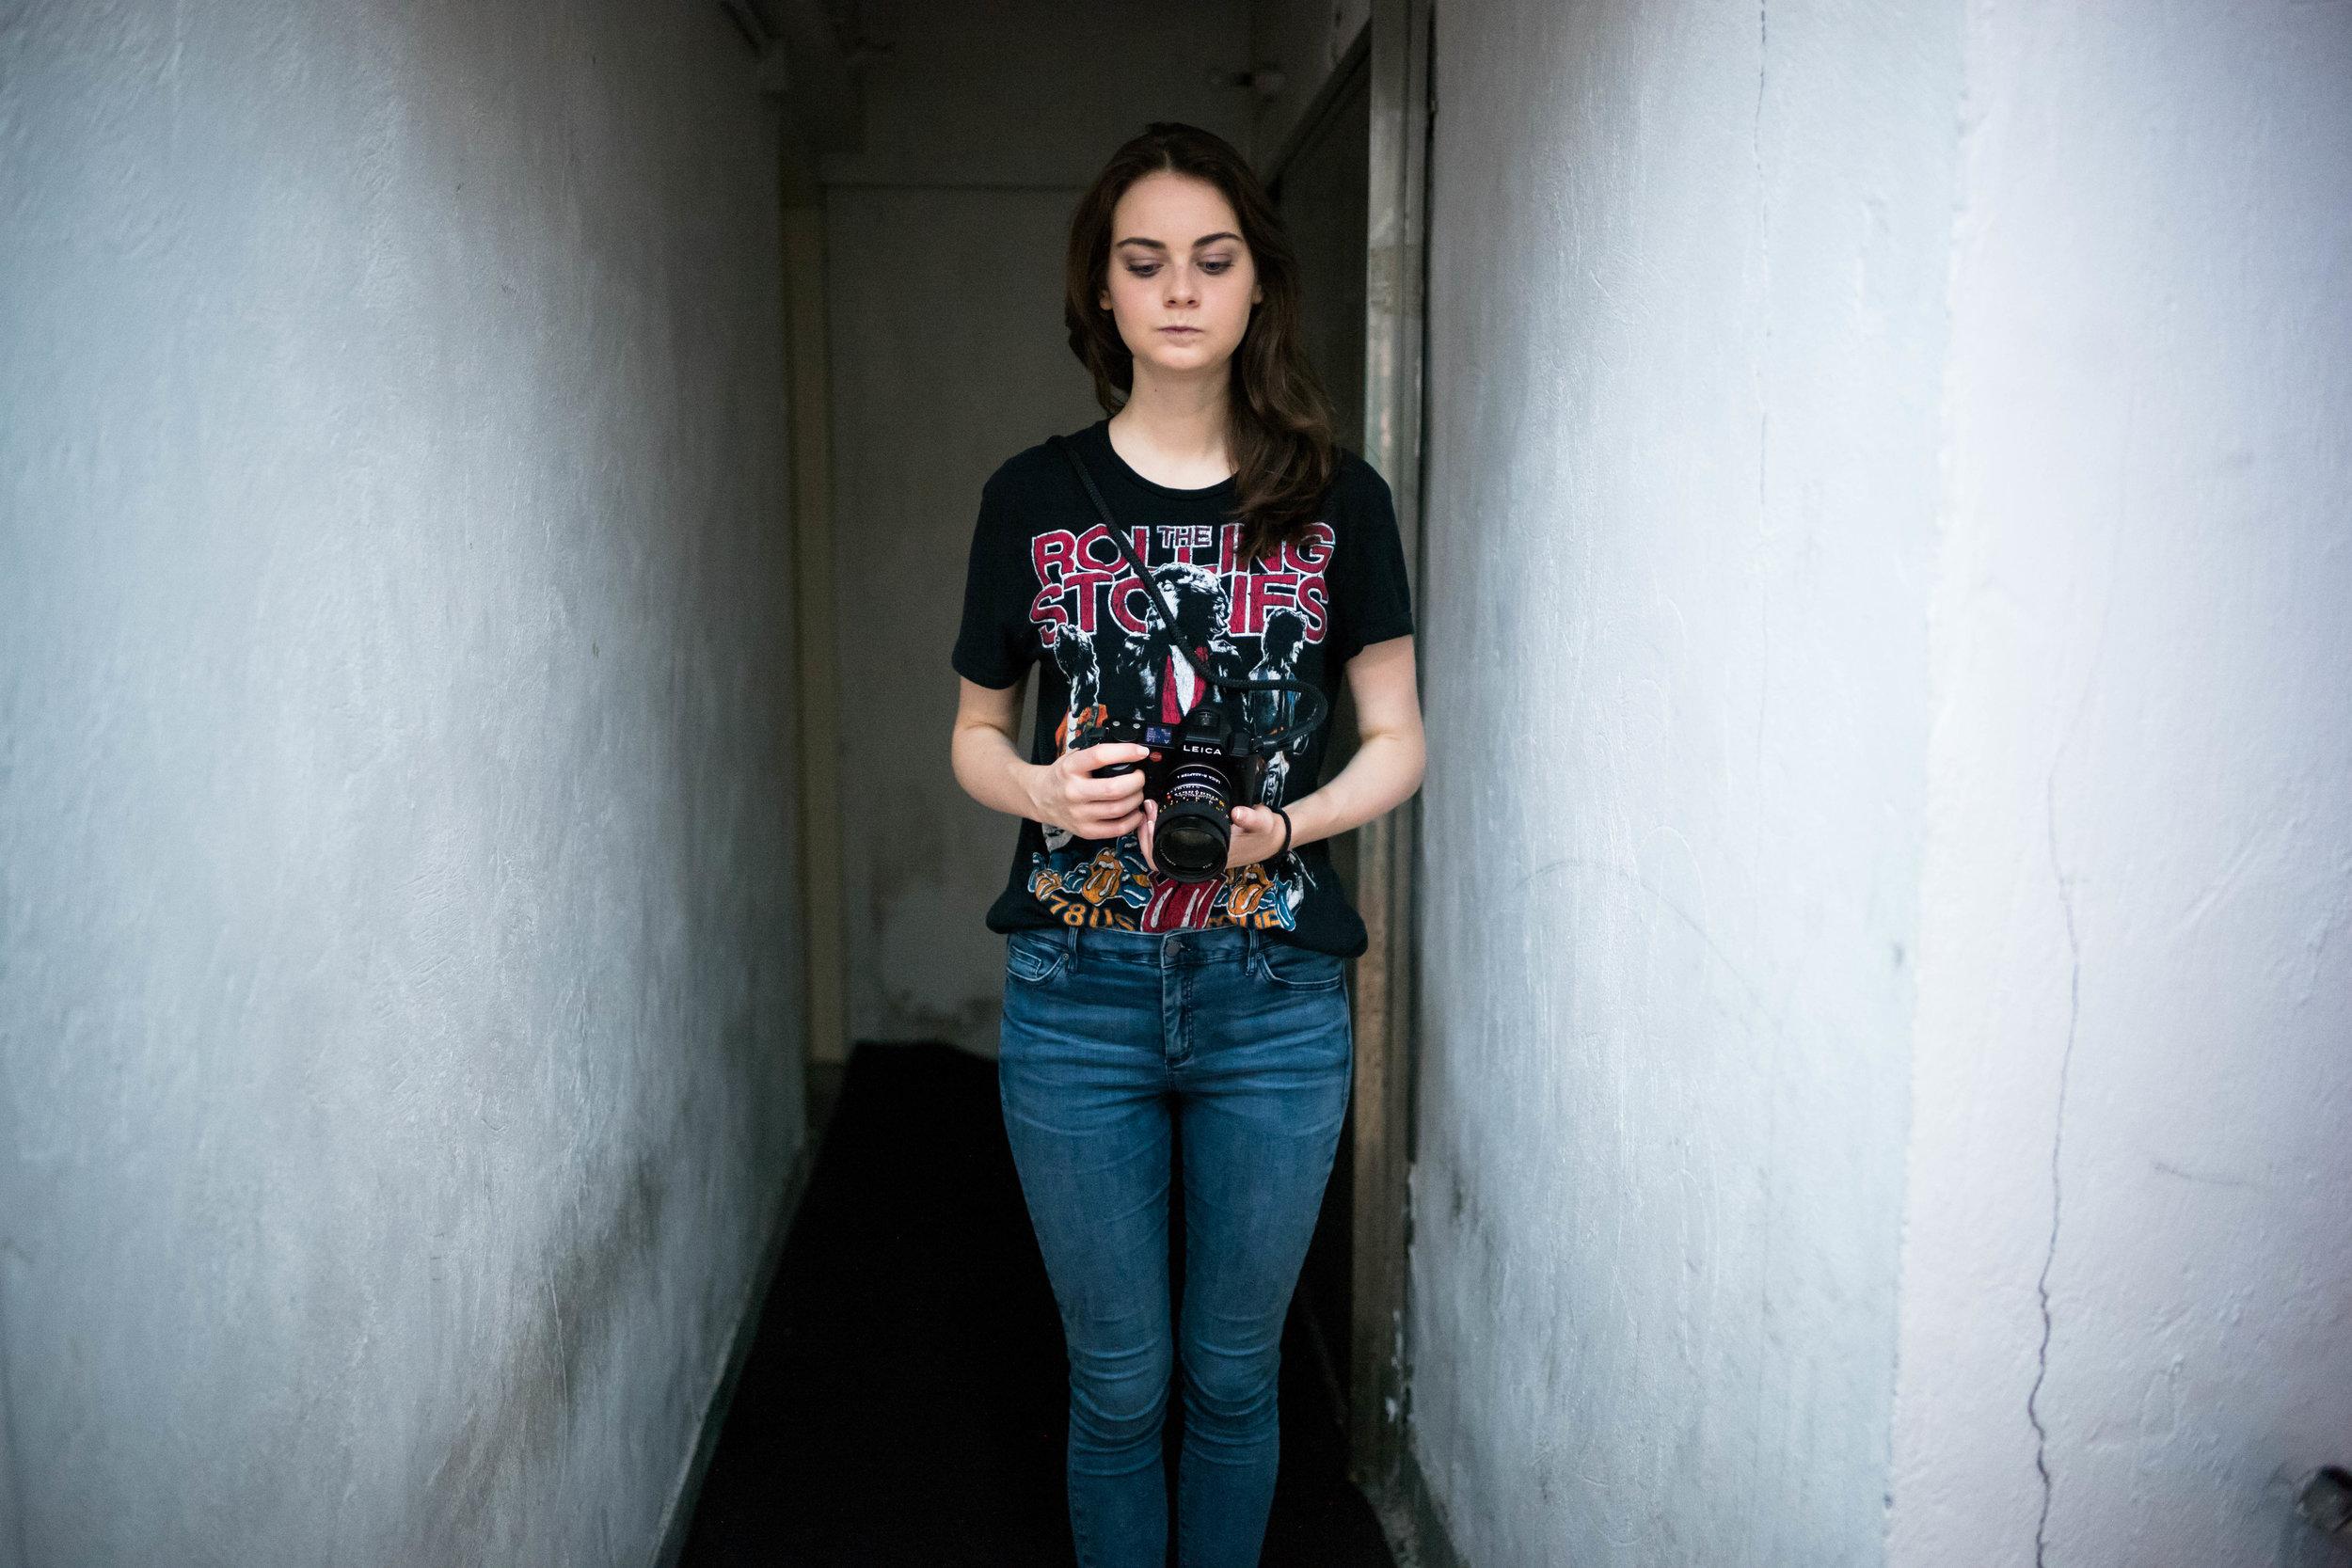 Bonus Image - Anna prepping for a shot. Leica M10 + Visoflex 020 + 28mm f/1.4 Summilux-M ASPH